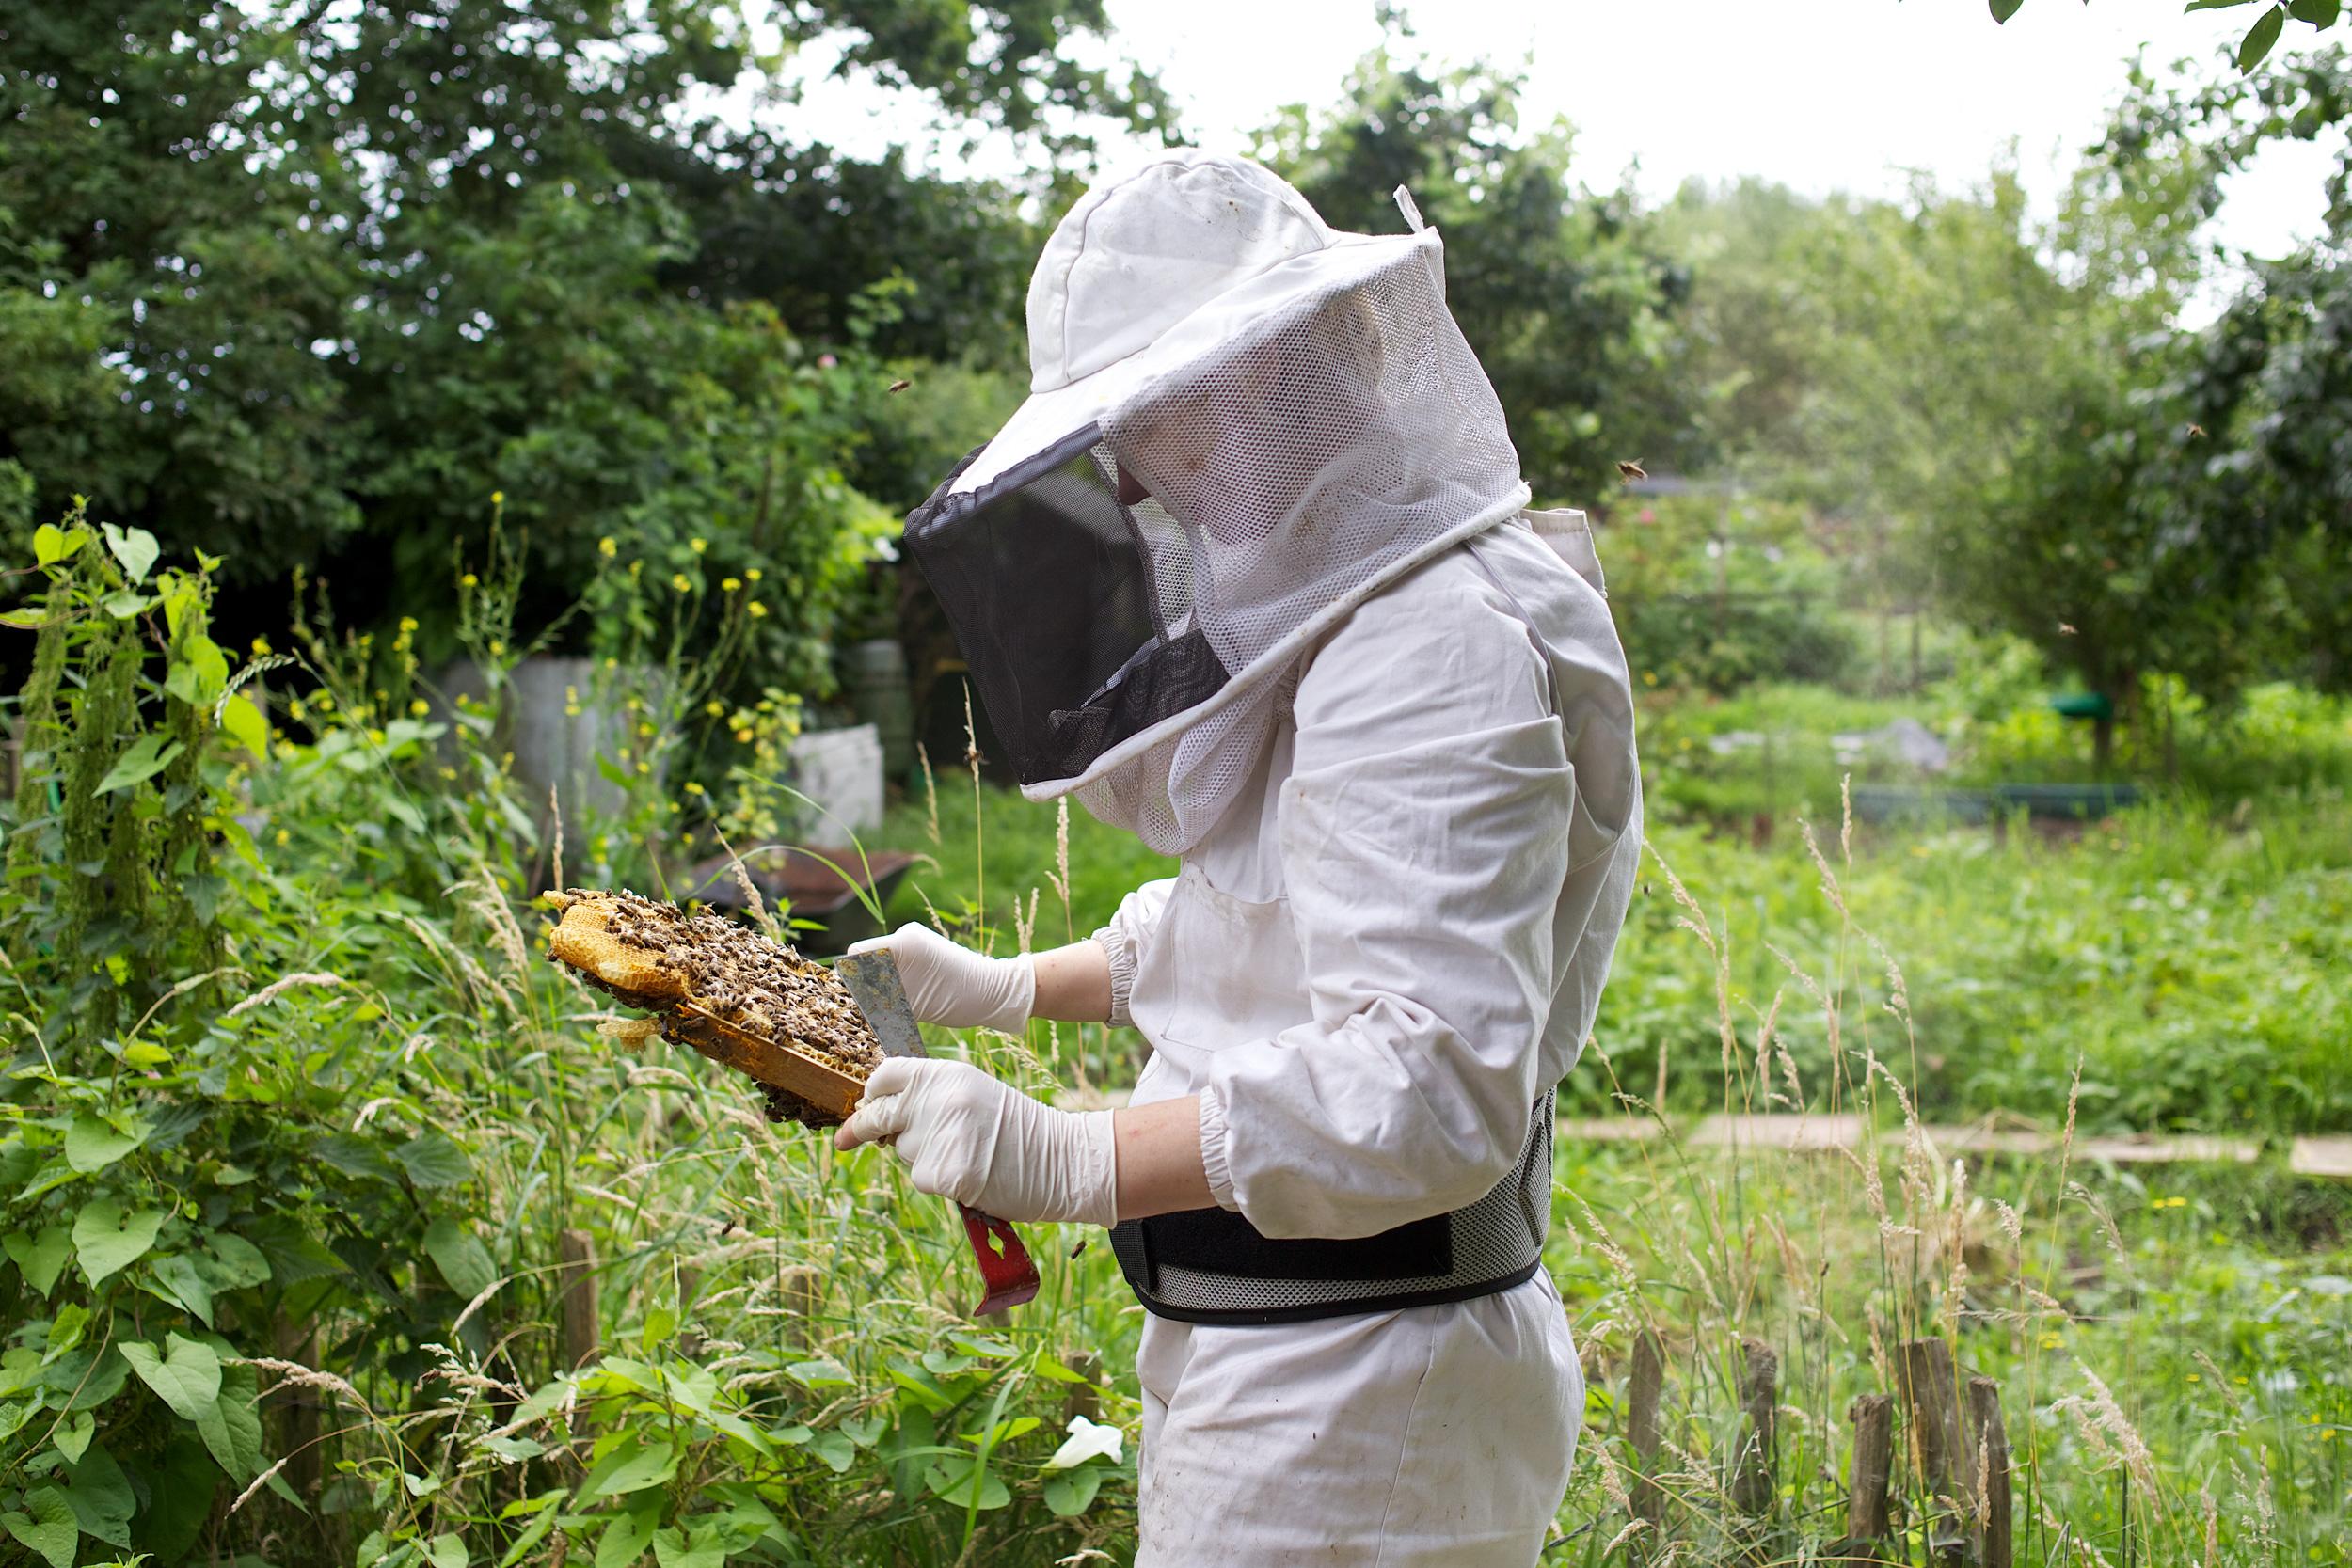 bees-camilla-goddard-katie-hyams-reportage-01.jpg